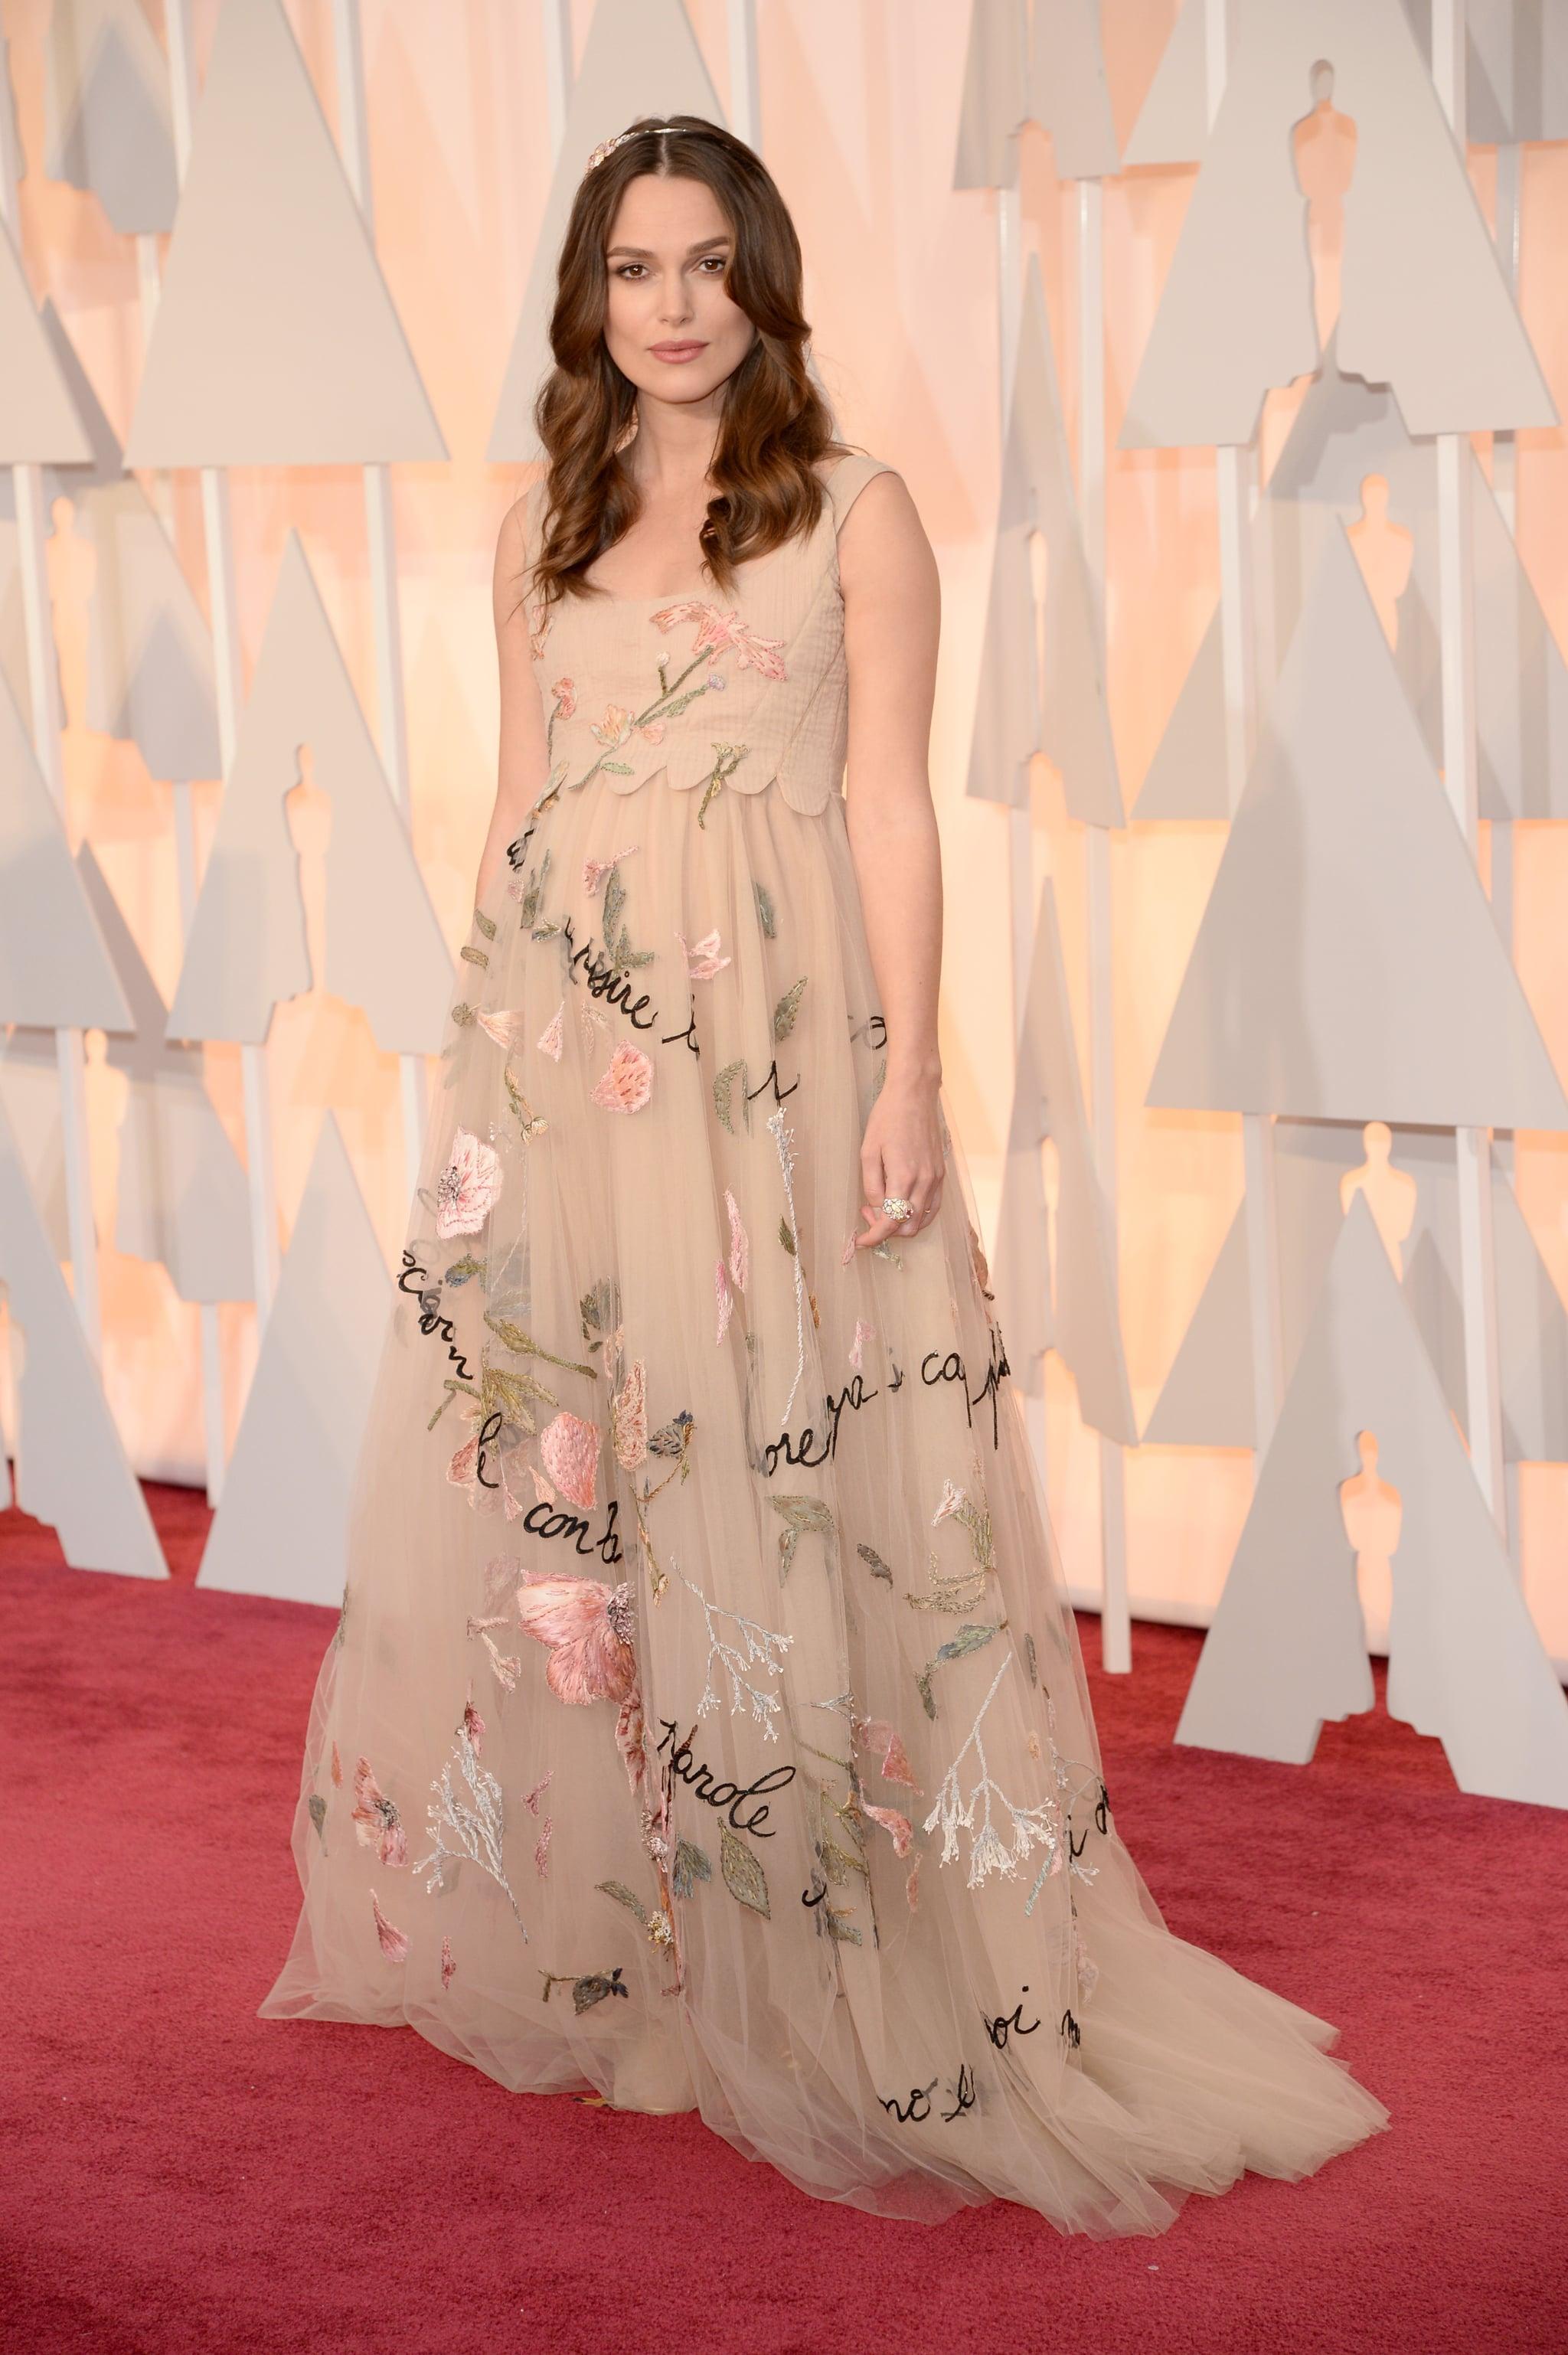 Keira Knightley Red Carpet Dresses Keira Knightley | See ...